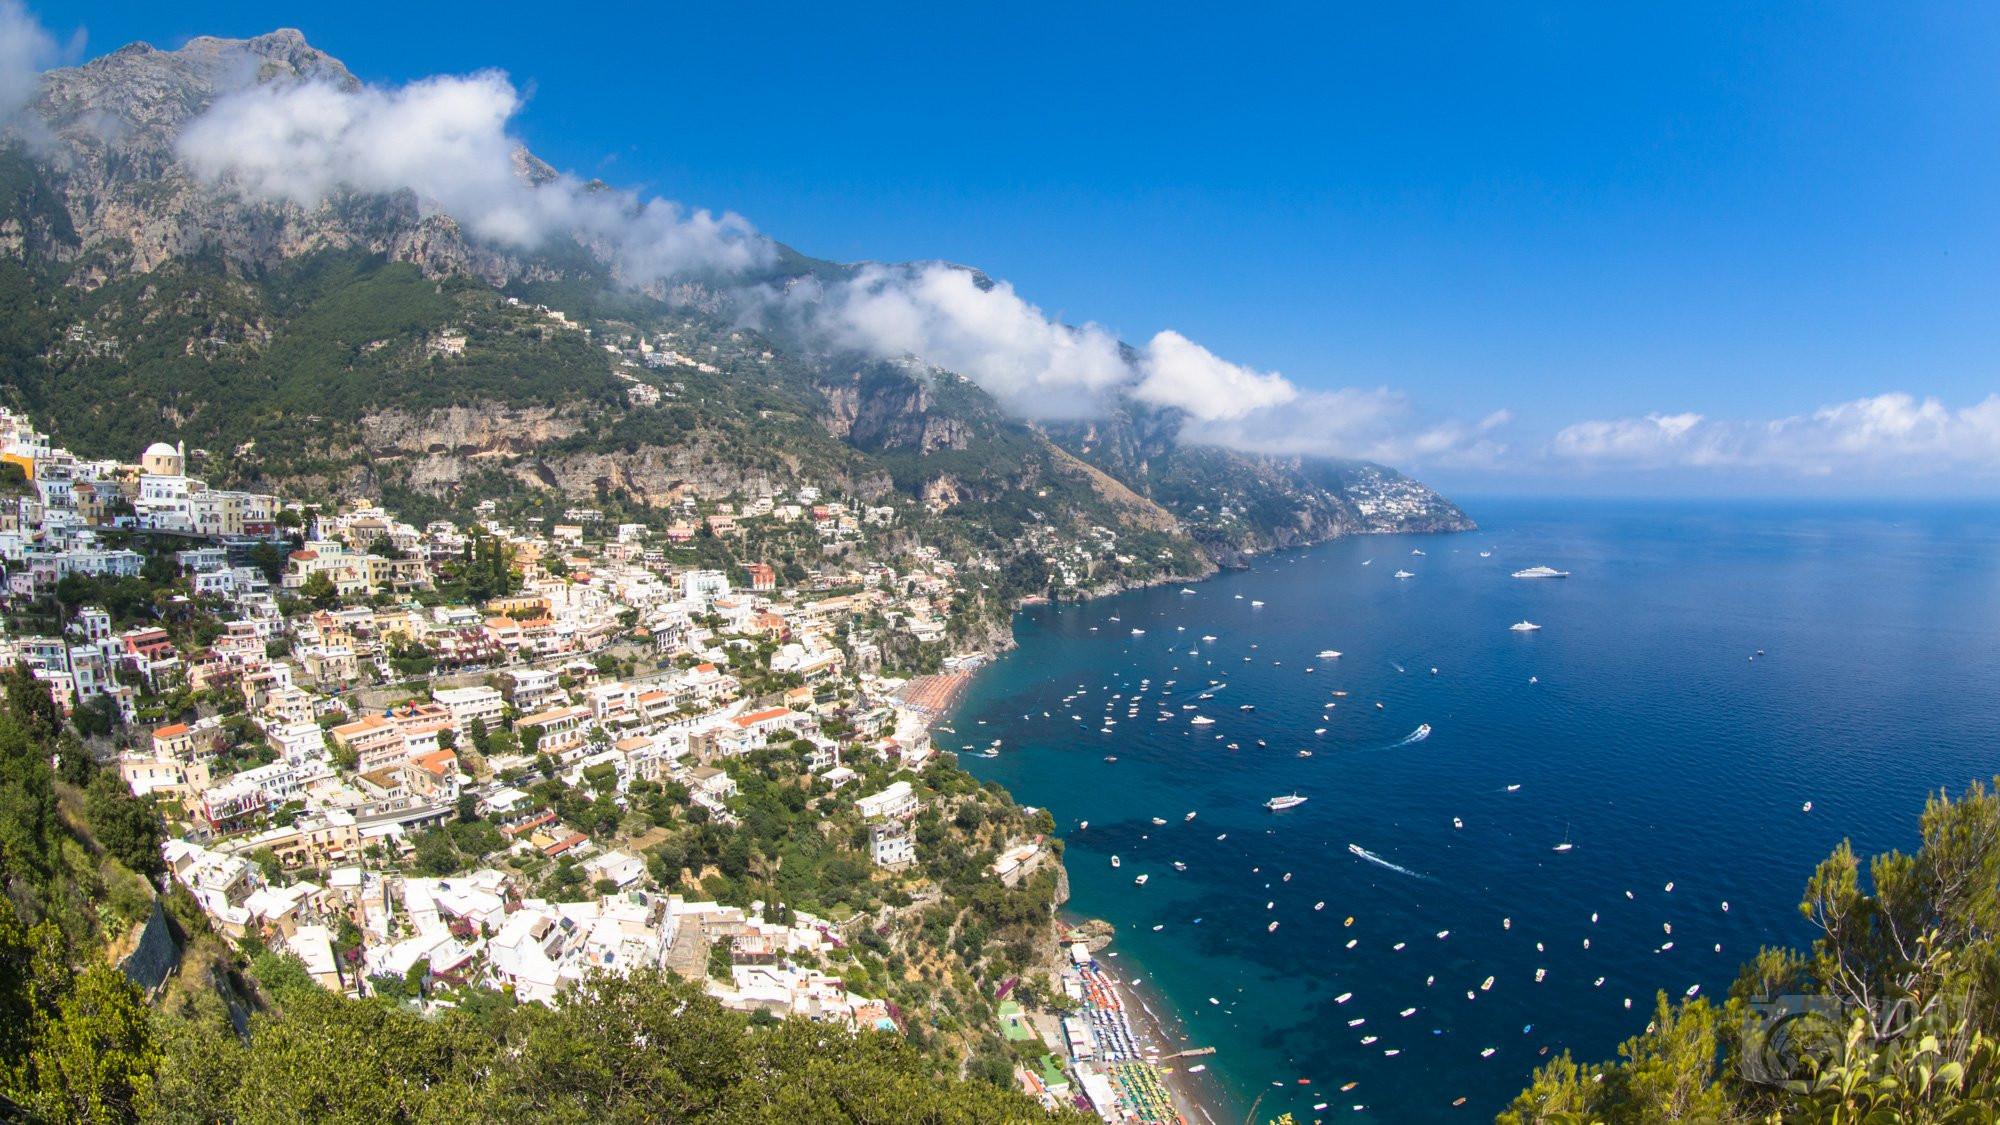 Amalfi coastline and Lattari Mountains, Italy